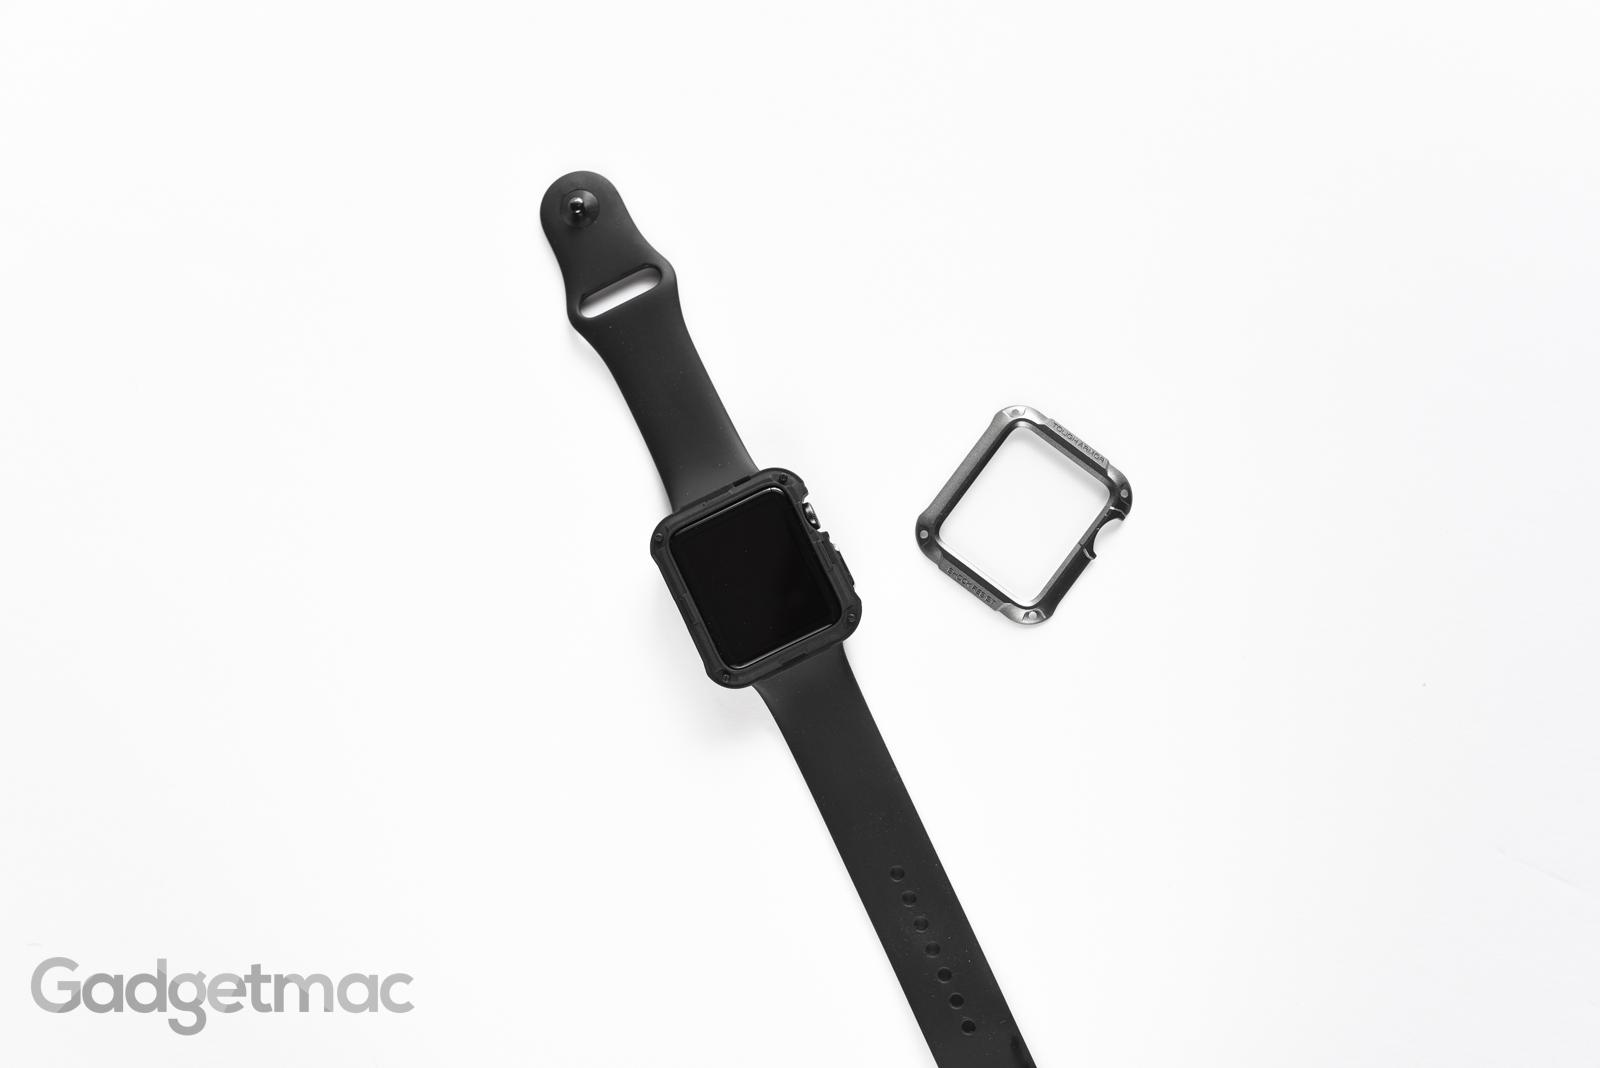 spigen-apple-watch-tough-armor-case-with-built-in-screen-protector.jpg